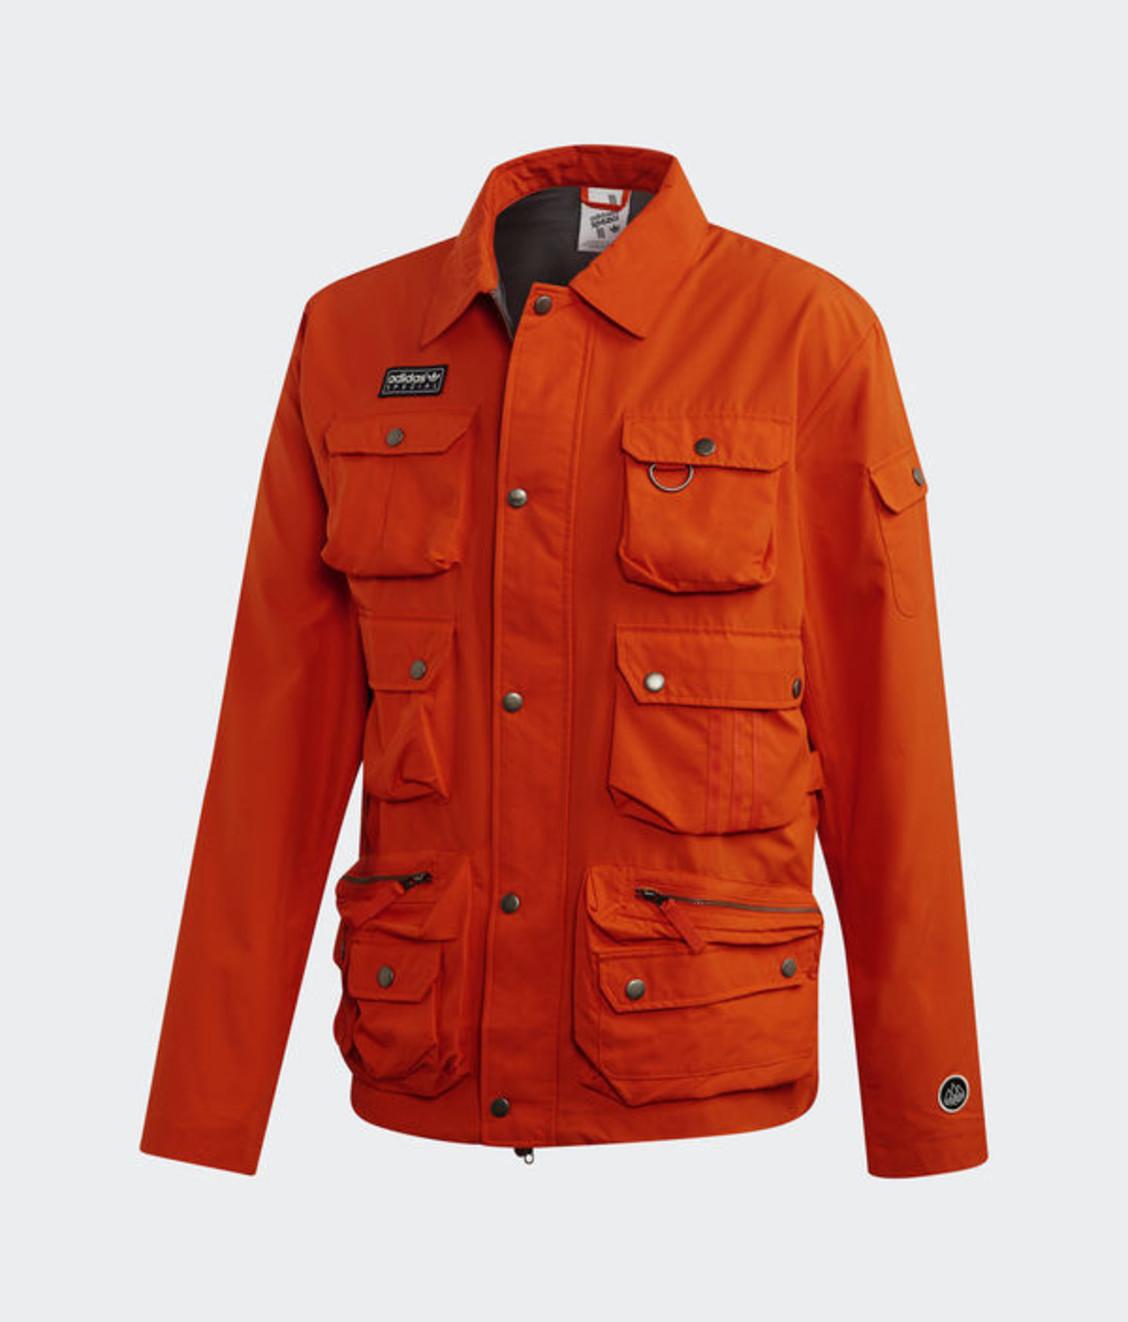 Adidas Adidas SPZL Wardour Military Jacket Orange